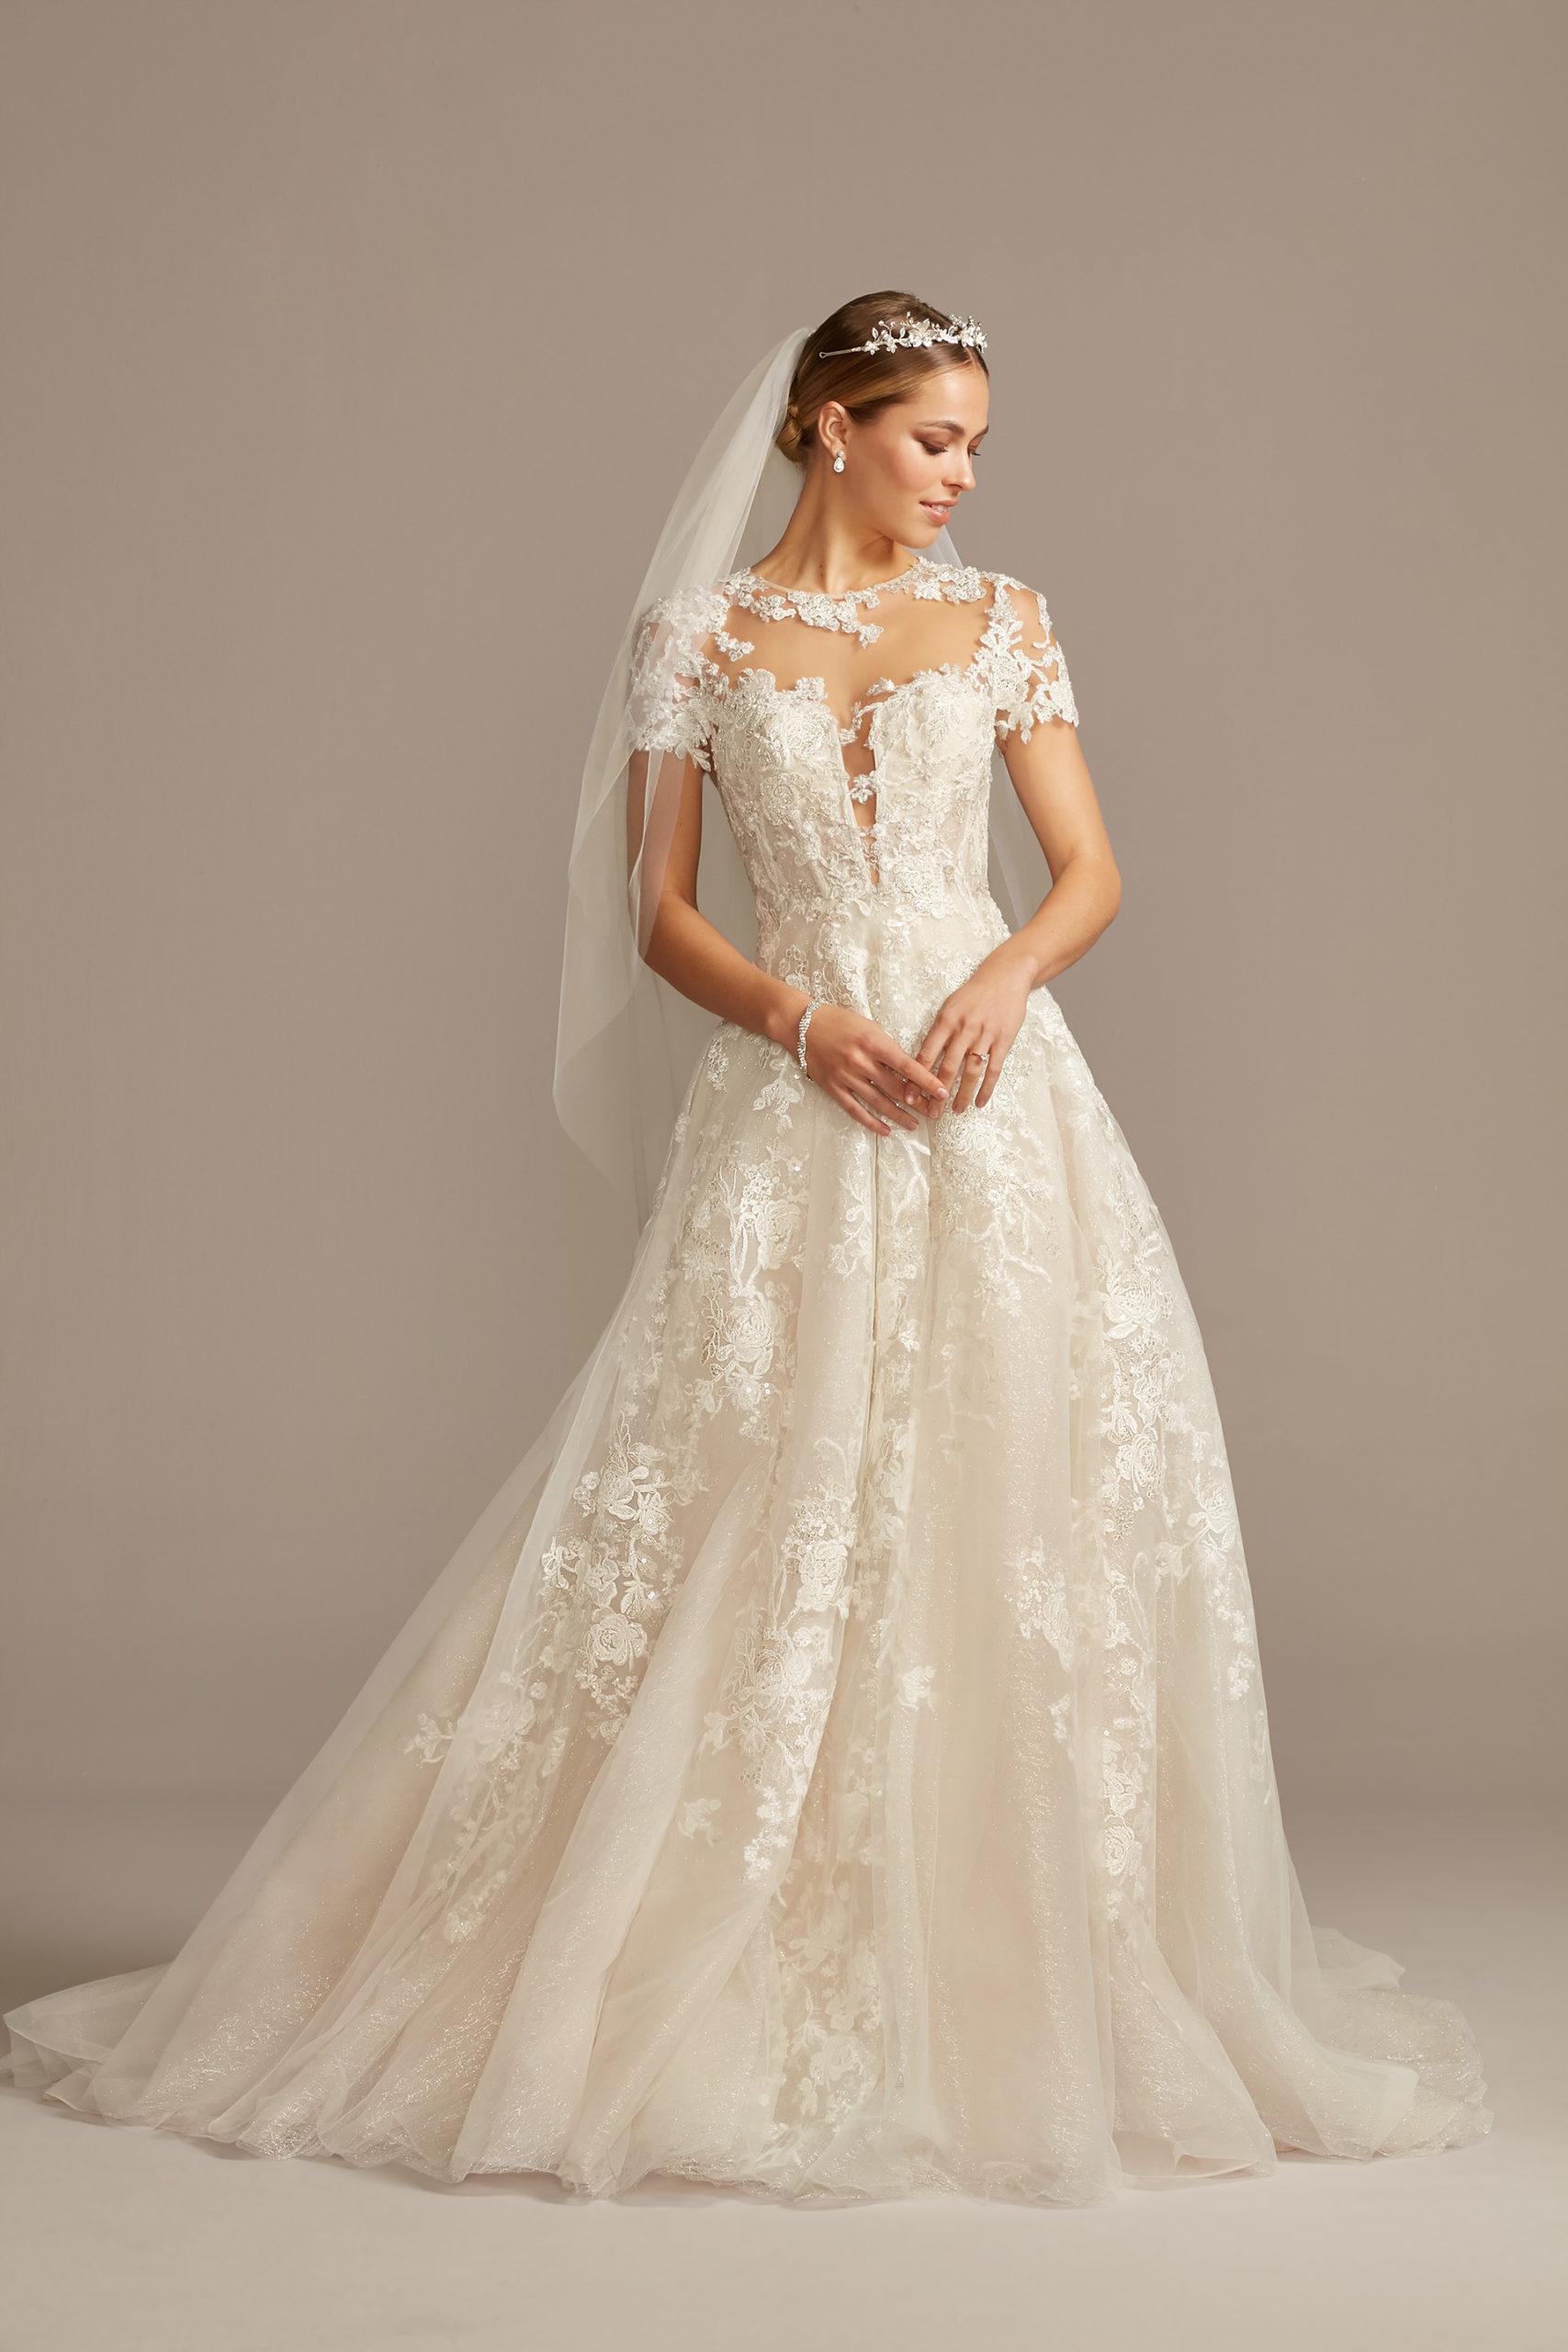 bride wearing wedding dress with short sleeves